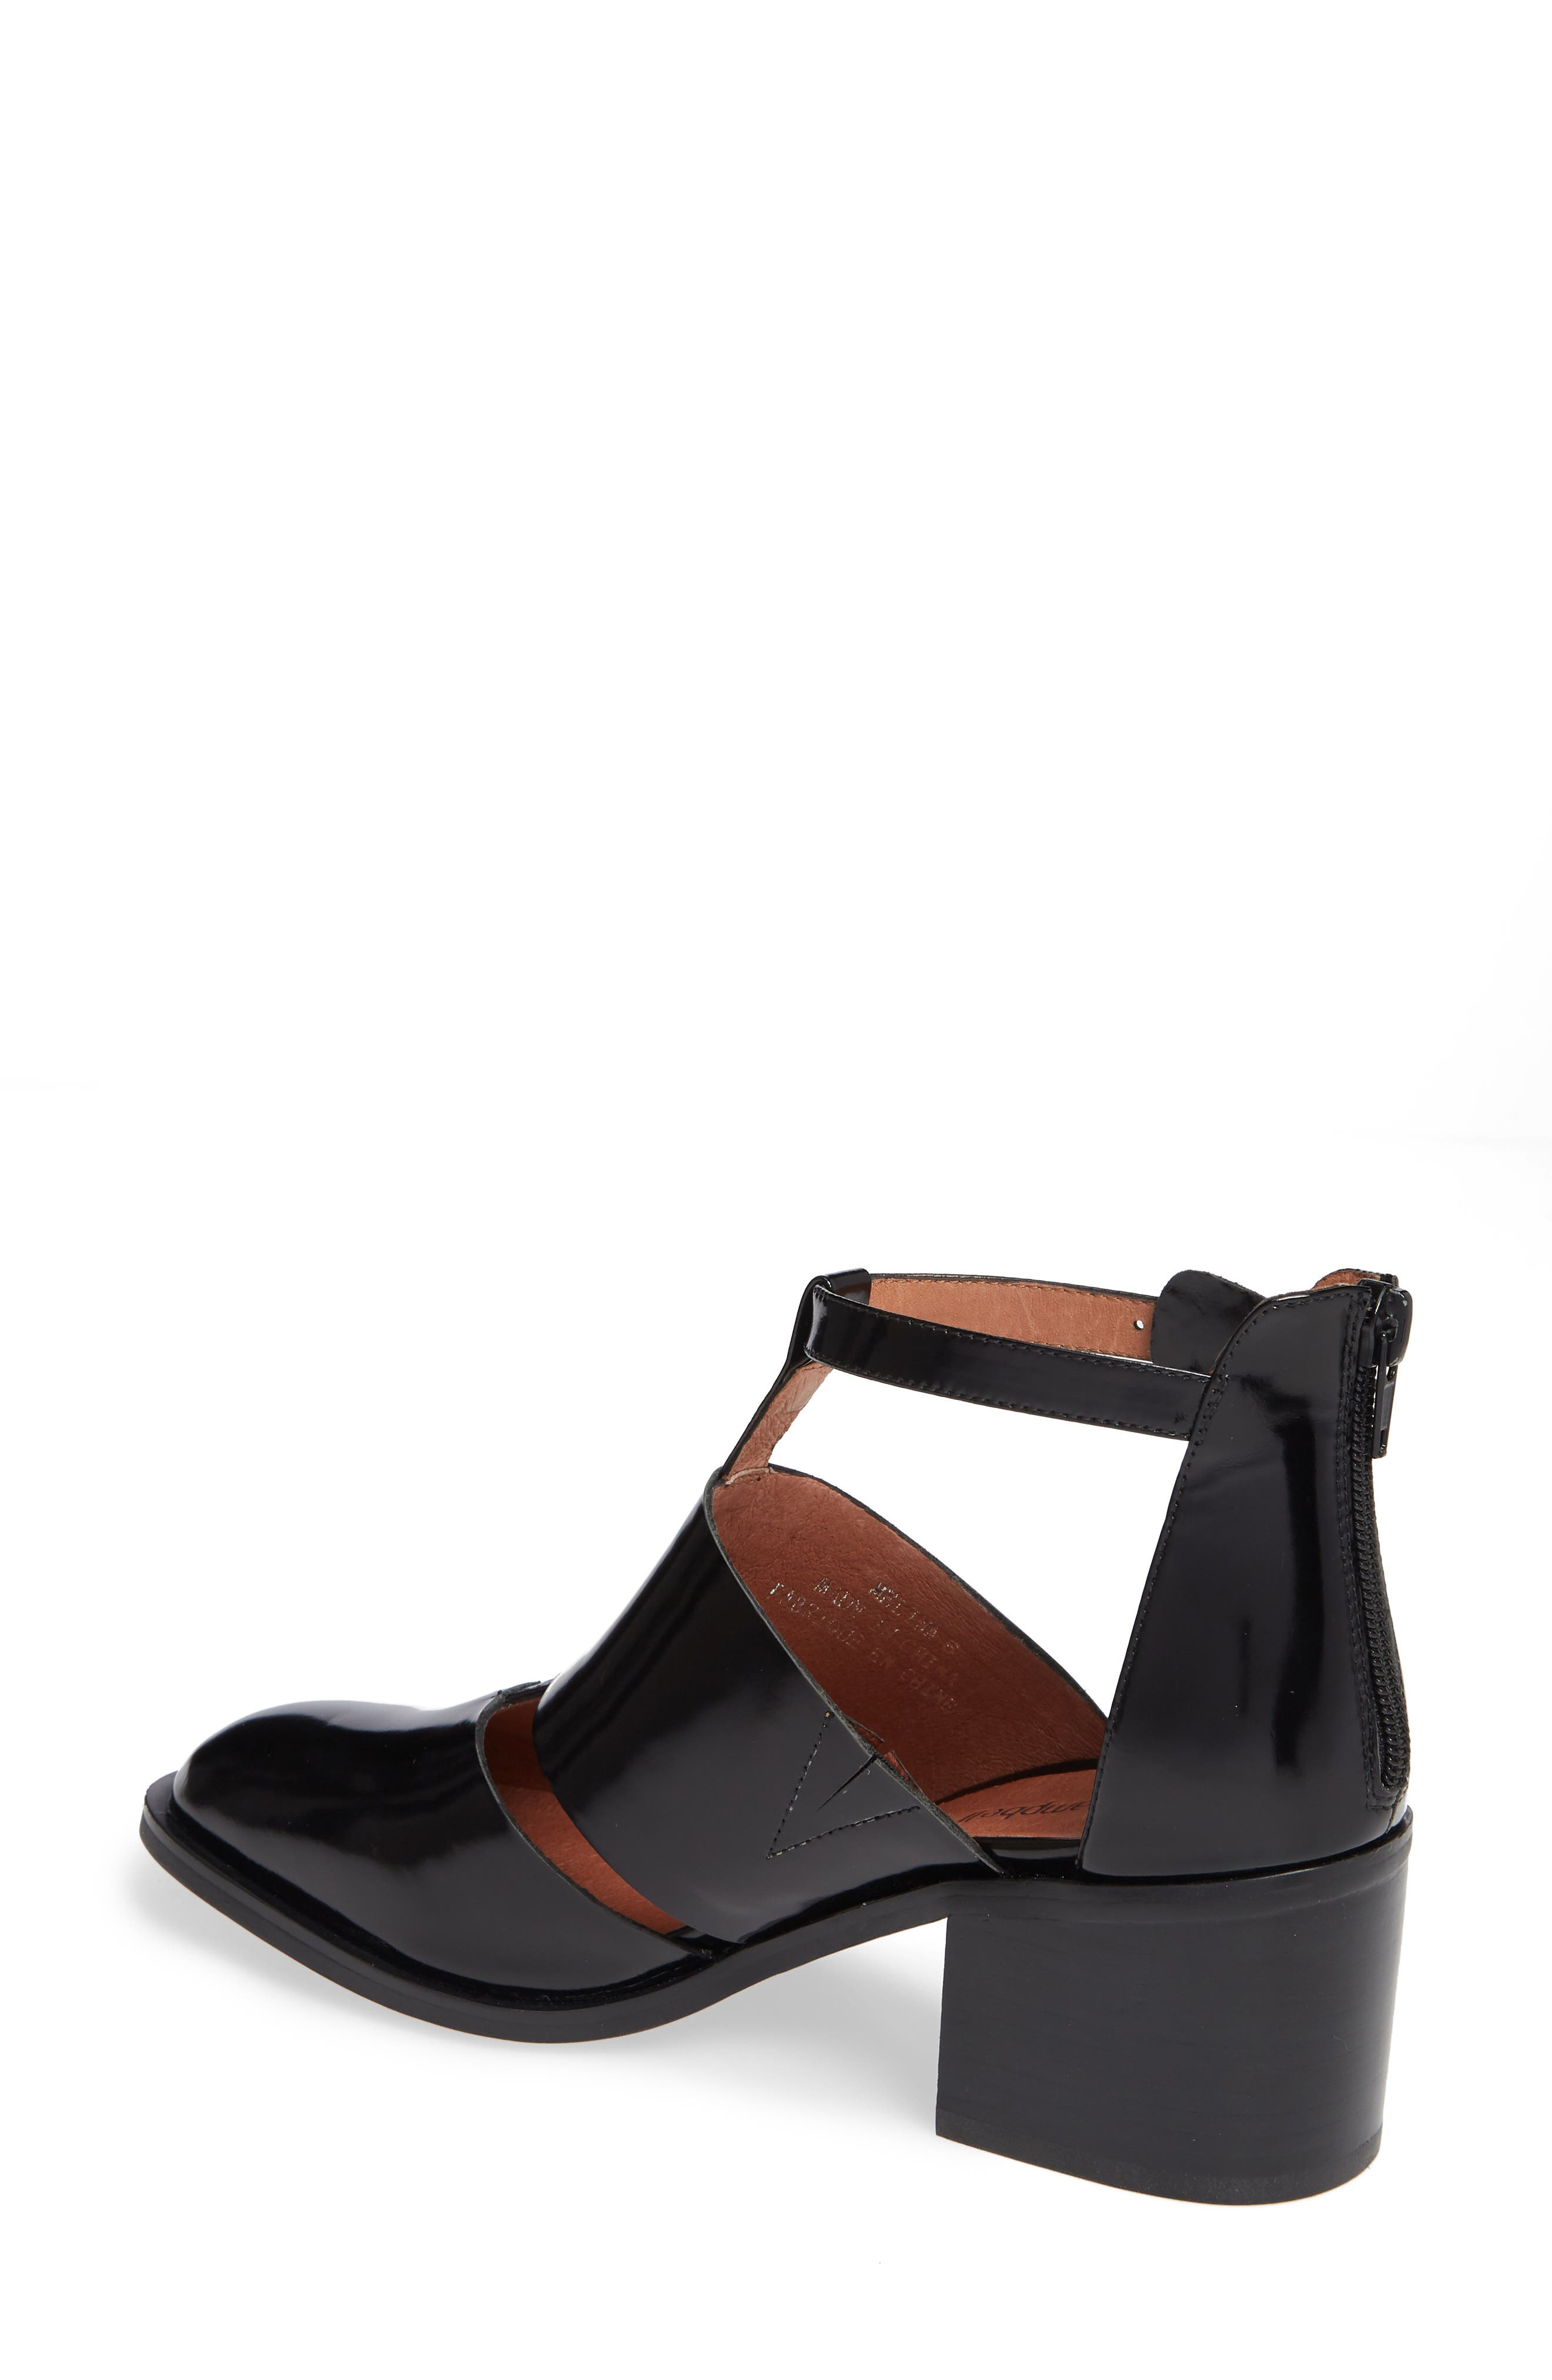 'Melina' T-Strap Shoe,                             Alternate thumbnail 2, color,                             Black Leather